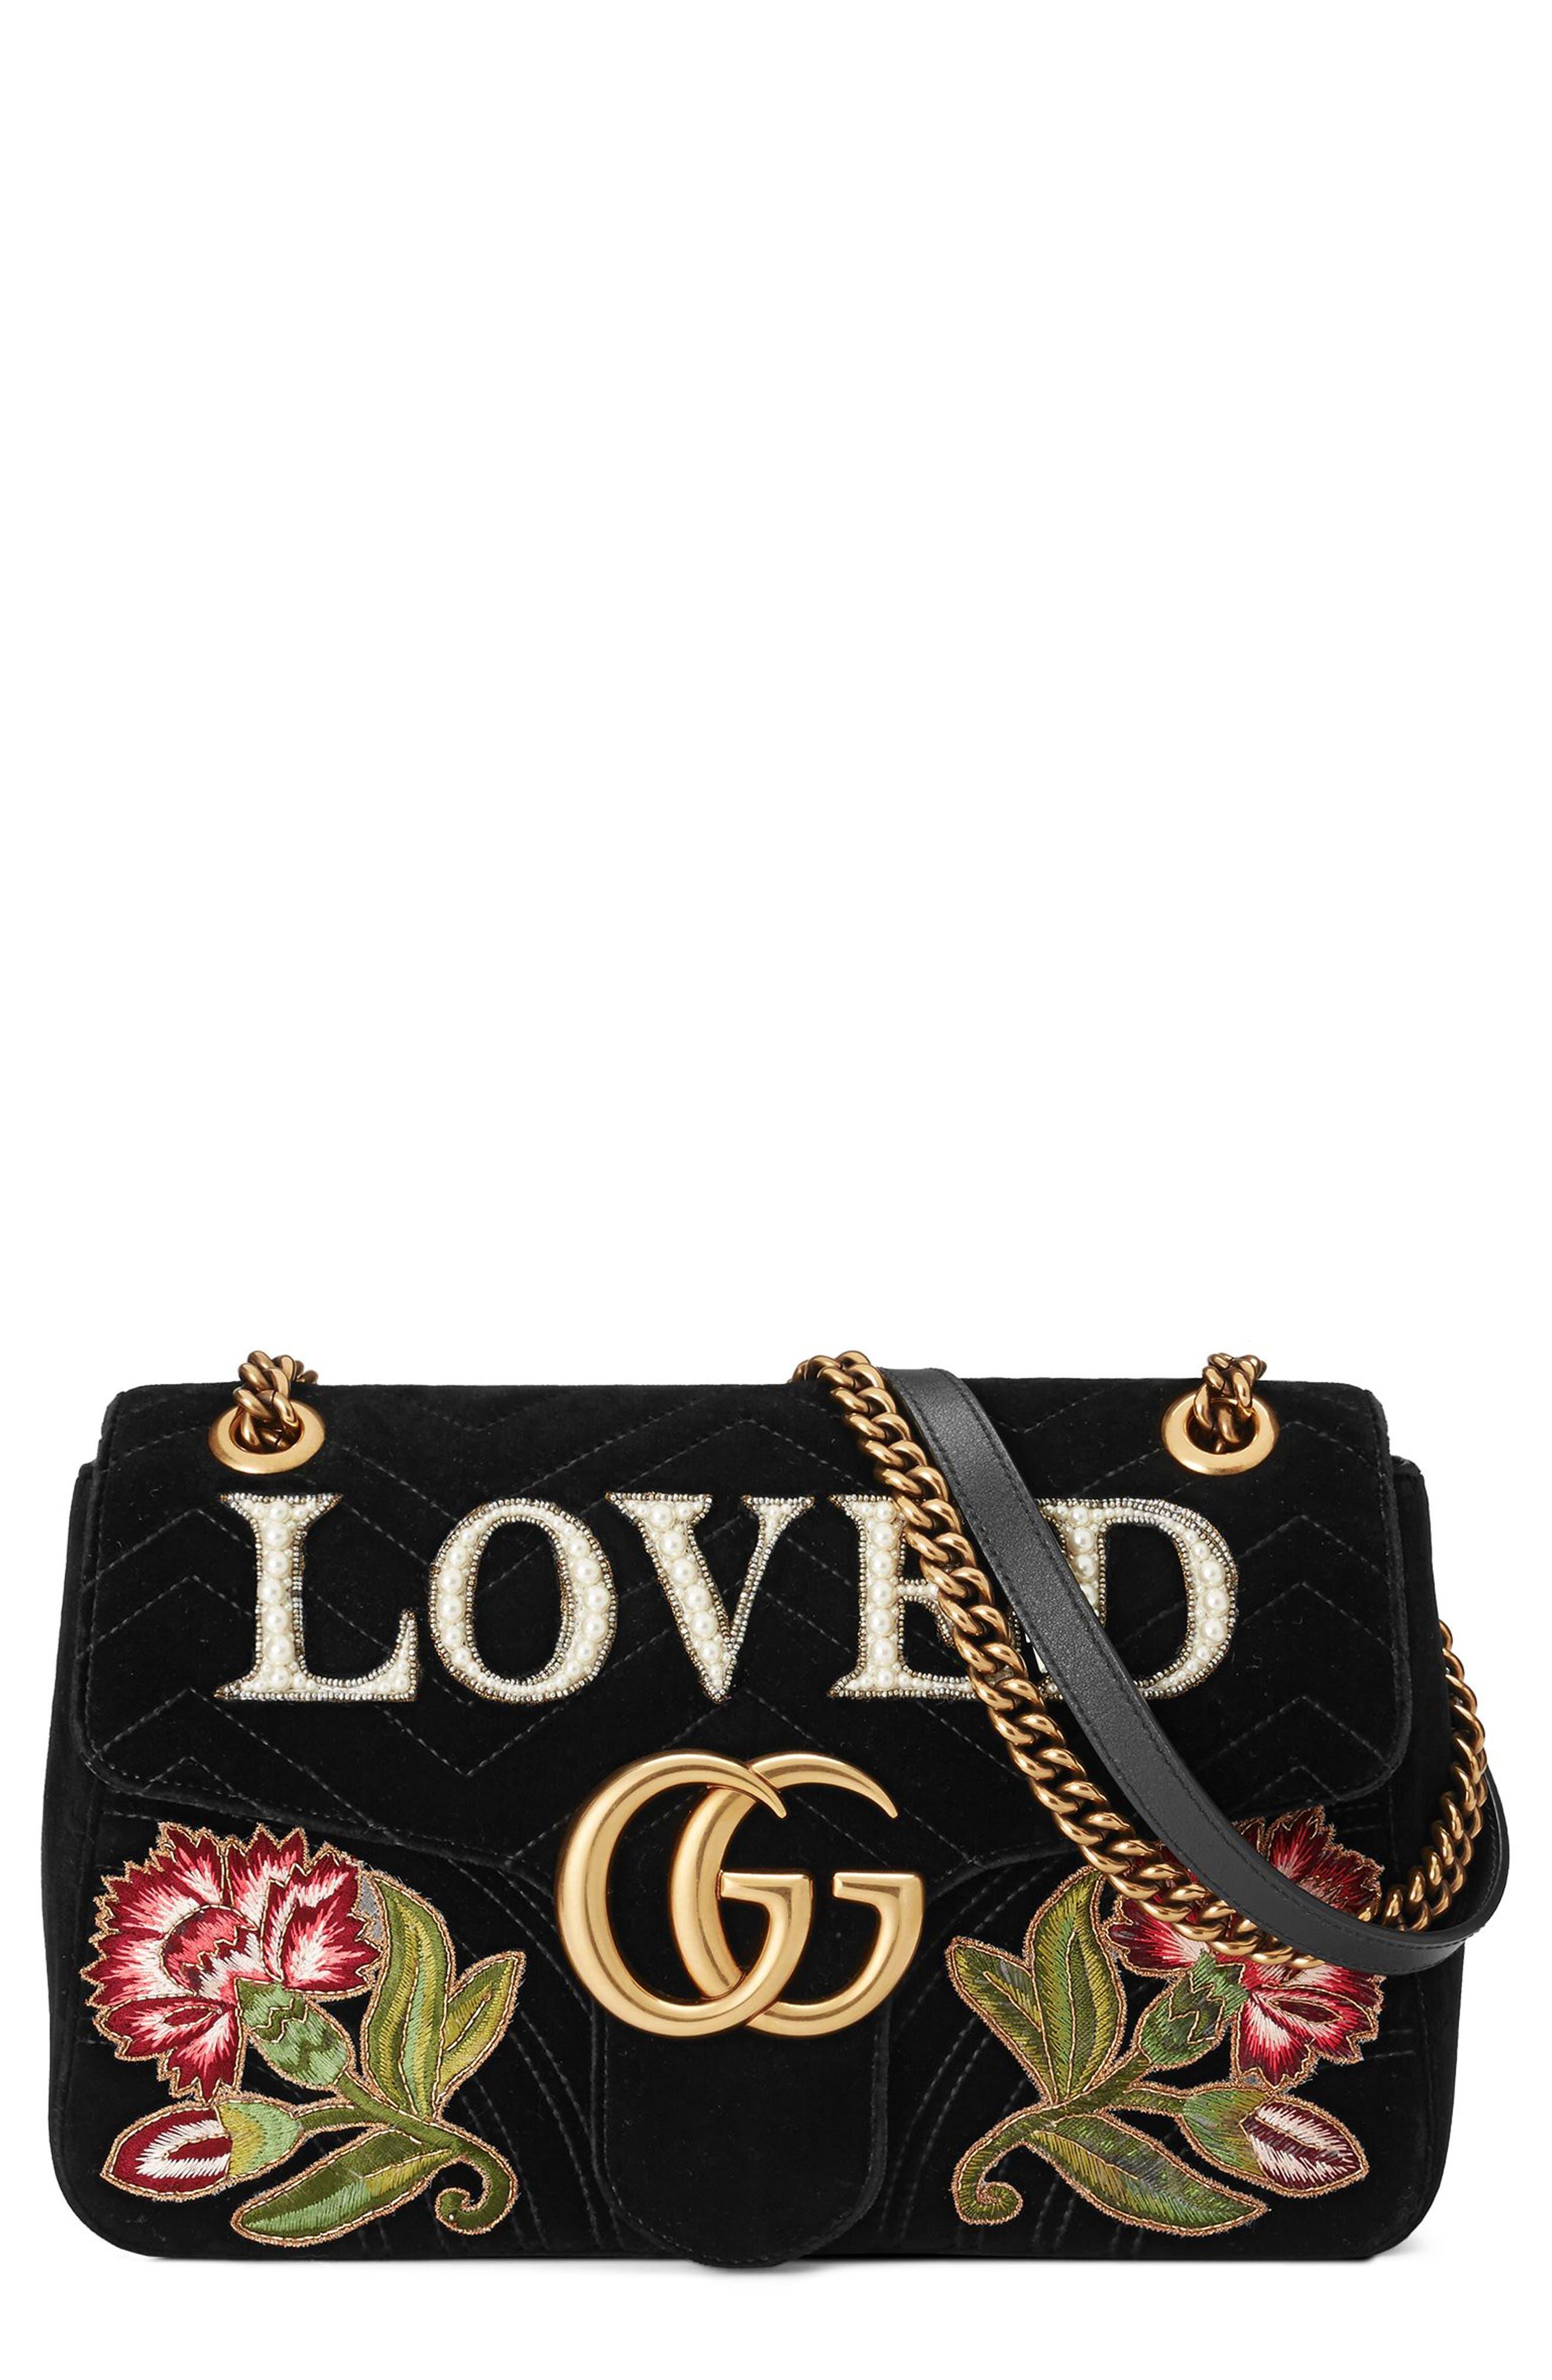 GG Marmont Loved Velvet Shoulder Bag,                             Main thumbnail 1, color,                             977